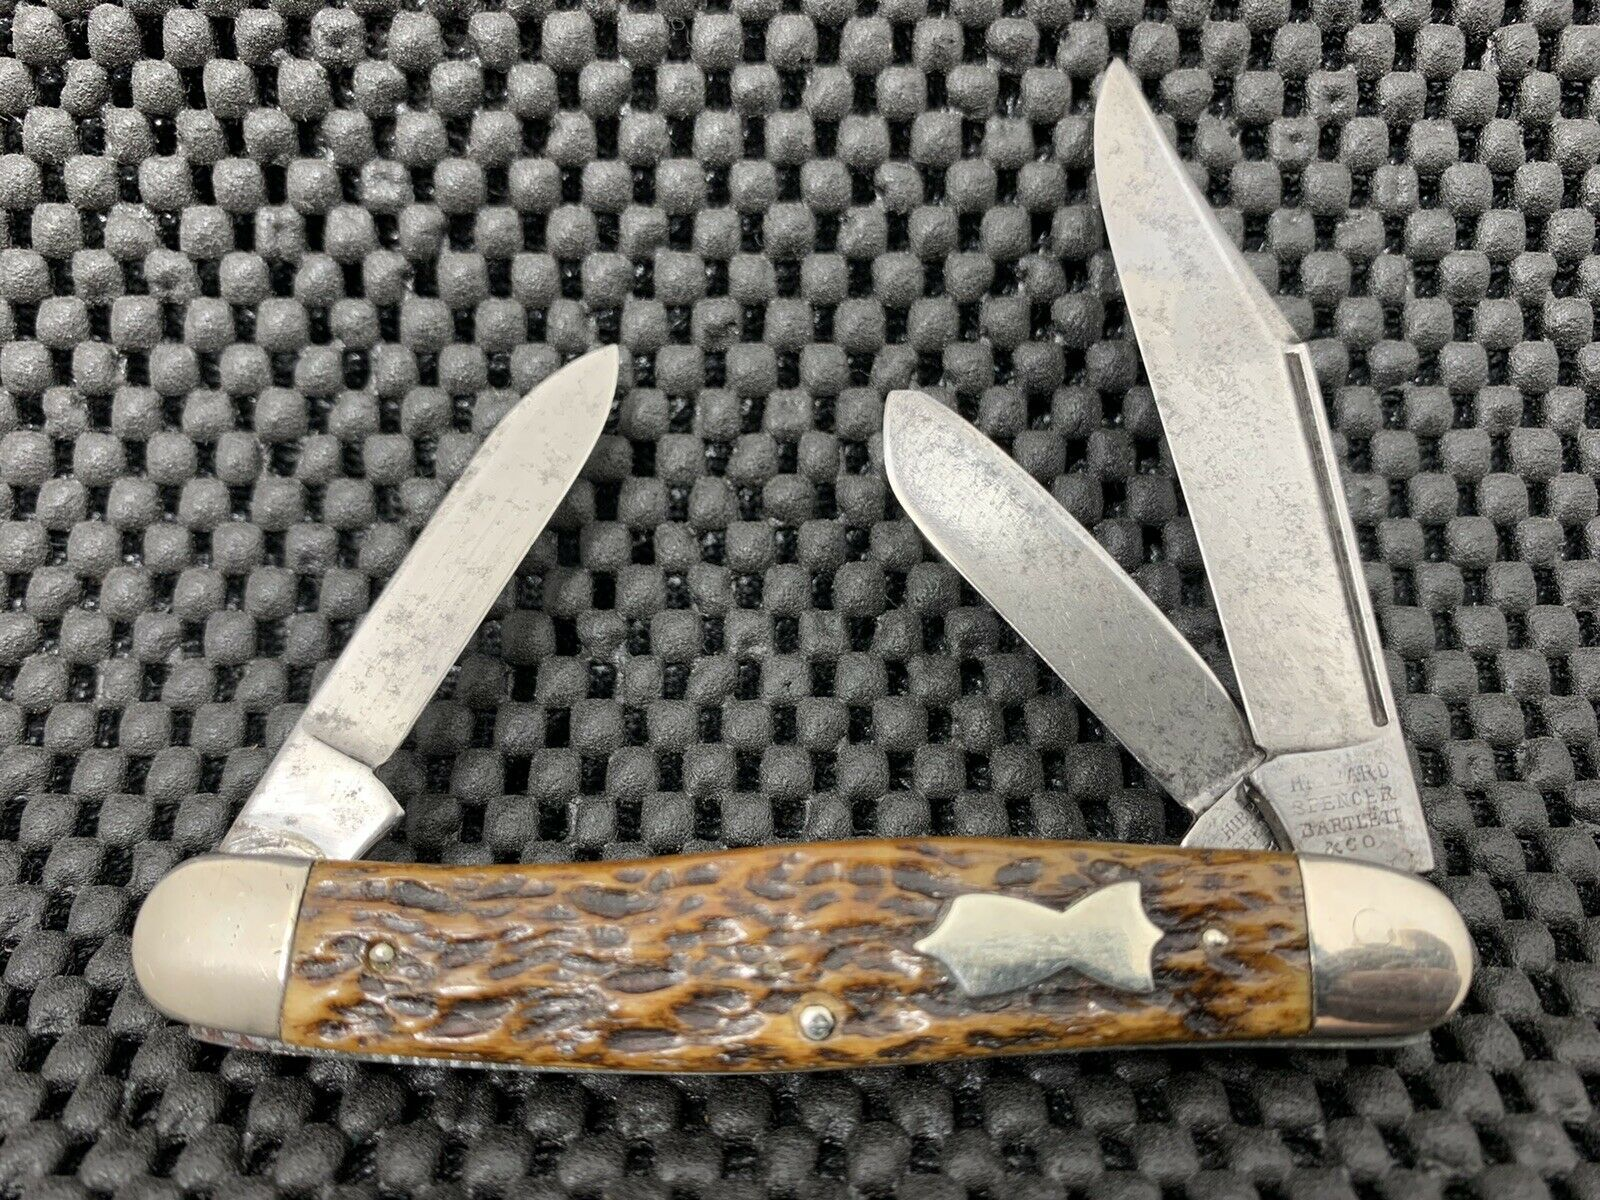 HIBBARD, SPENCER & BARTLETT KNIFE